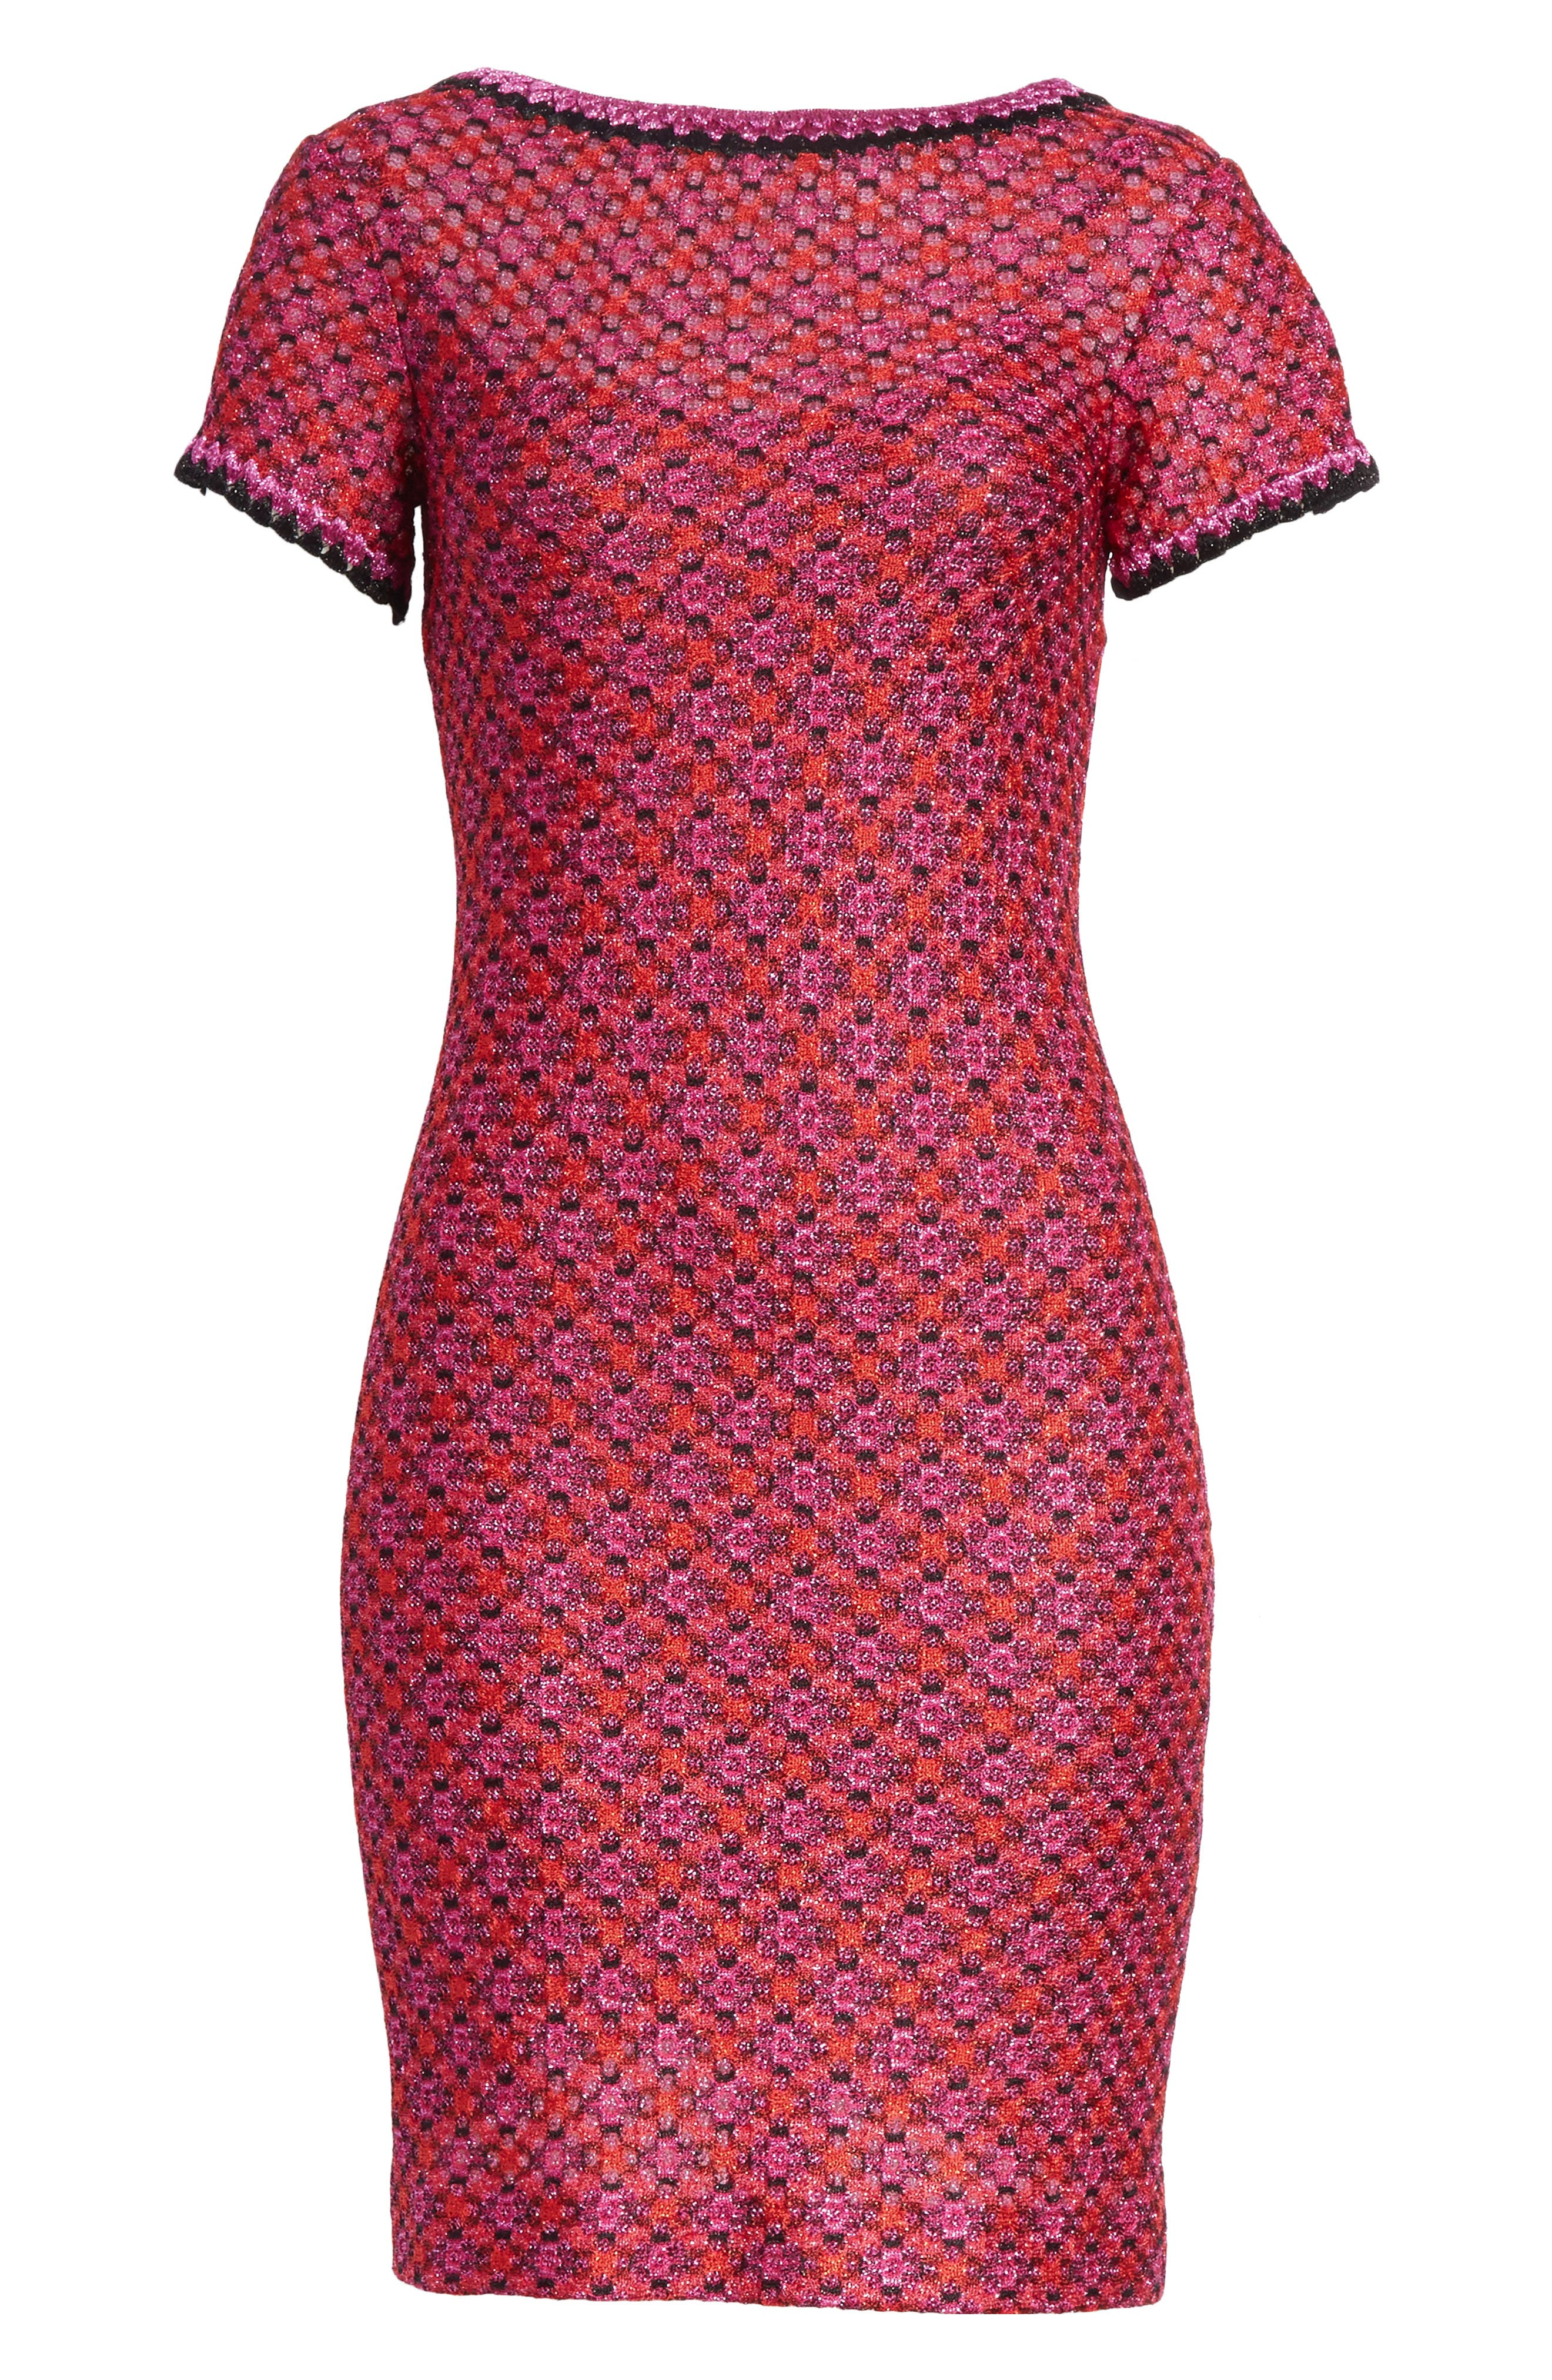 Metallic Zigzag Knit Dress,                             Alternate thumbnail 6, color,                             650